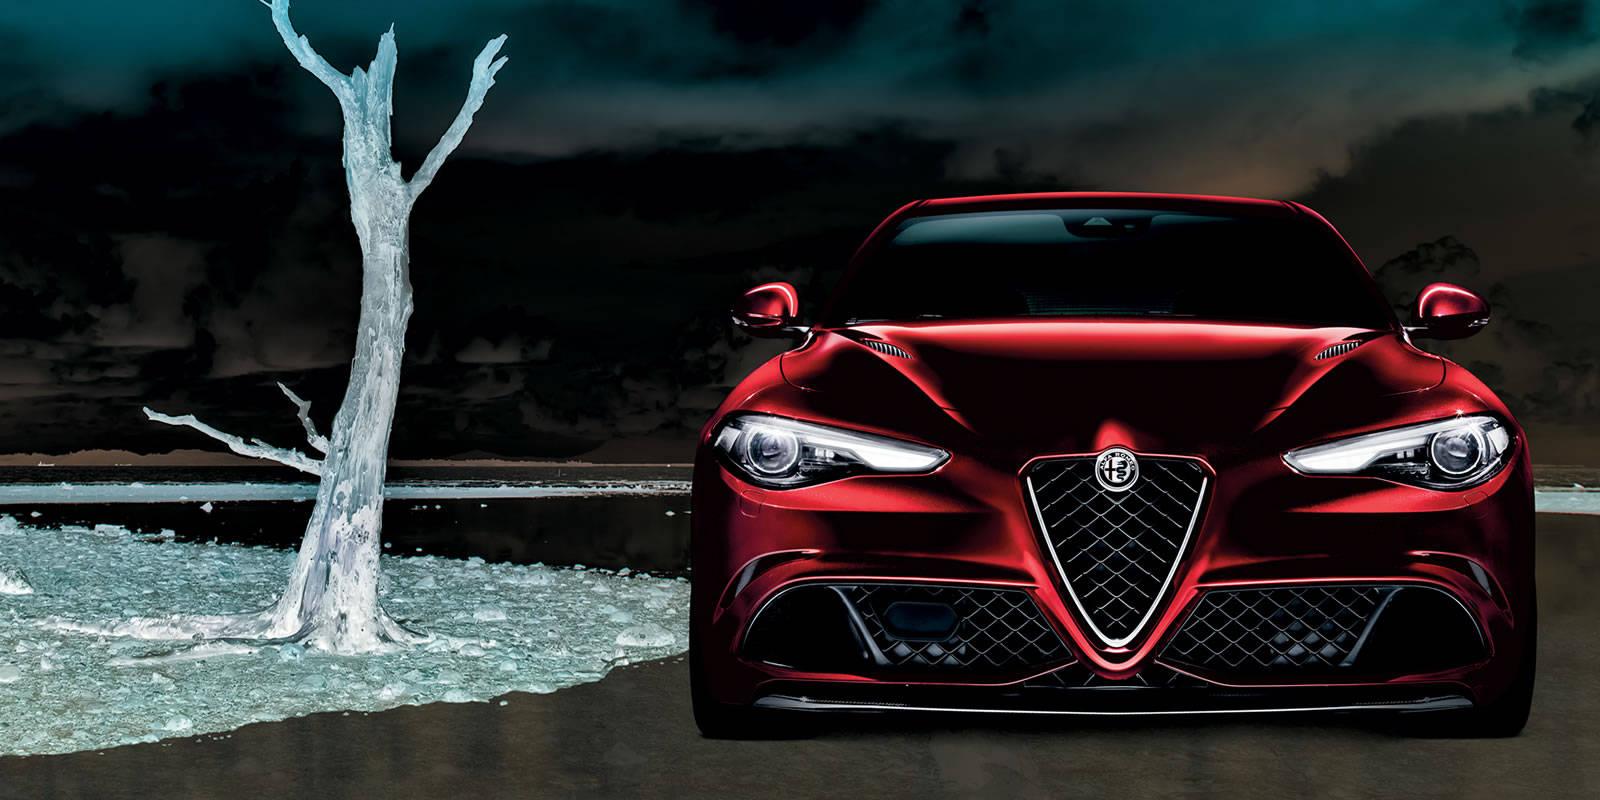 Price of Alfa Romeo Giulia 2017 in UAE – BuyMyLuxuryCar.com on giulietta and romeo, uggs on sale men's romeo, things that describe romeo, alpha romeo, ver videos de romeo, alpine romeo, marseille romeo,